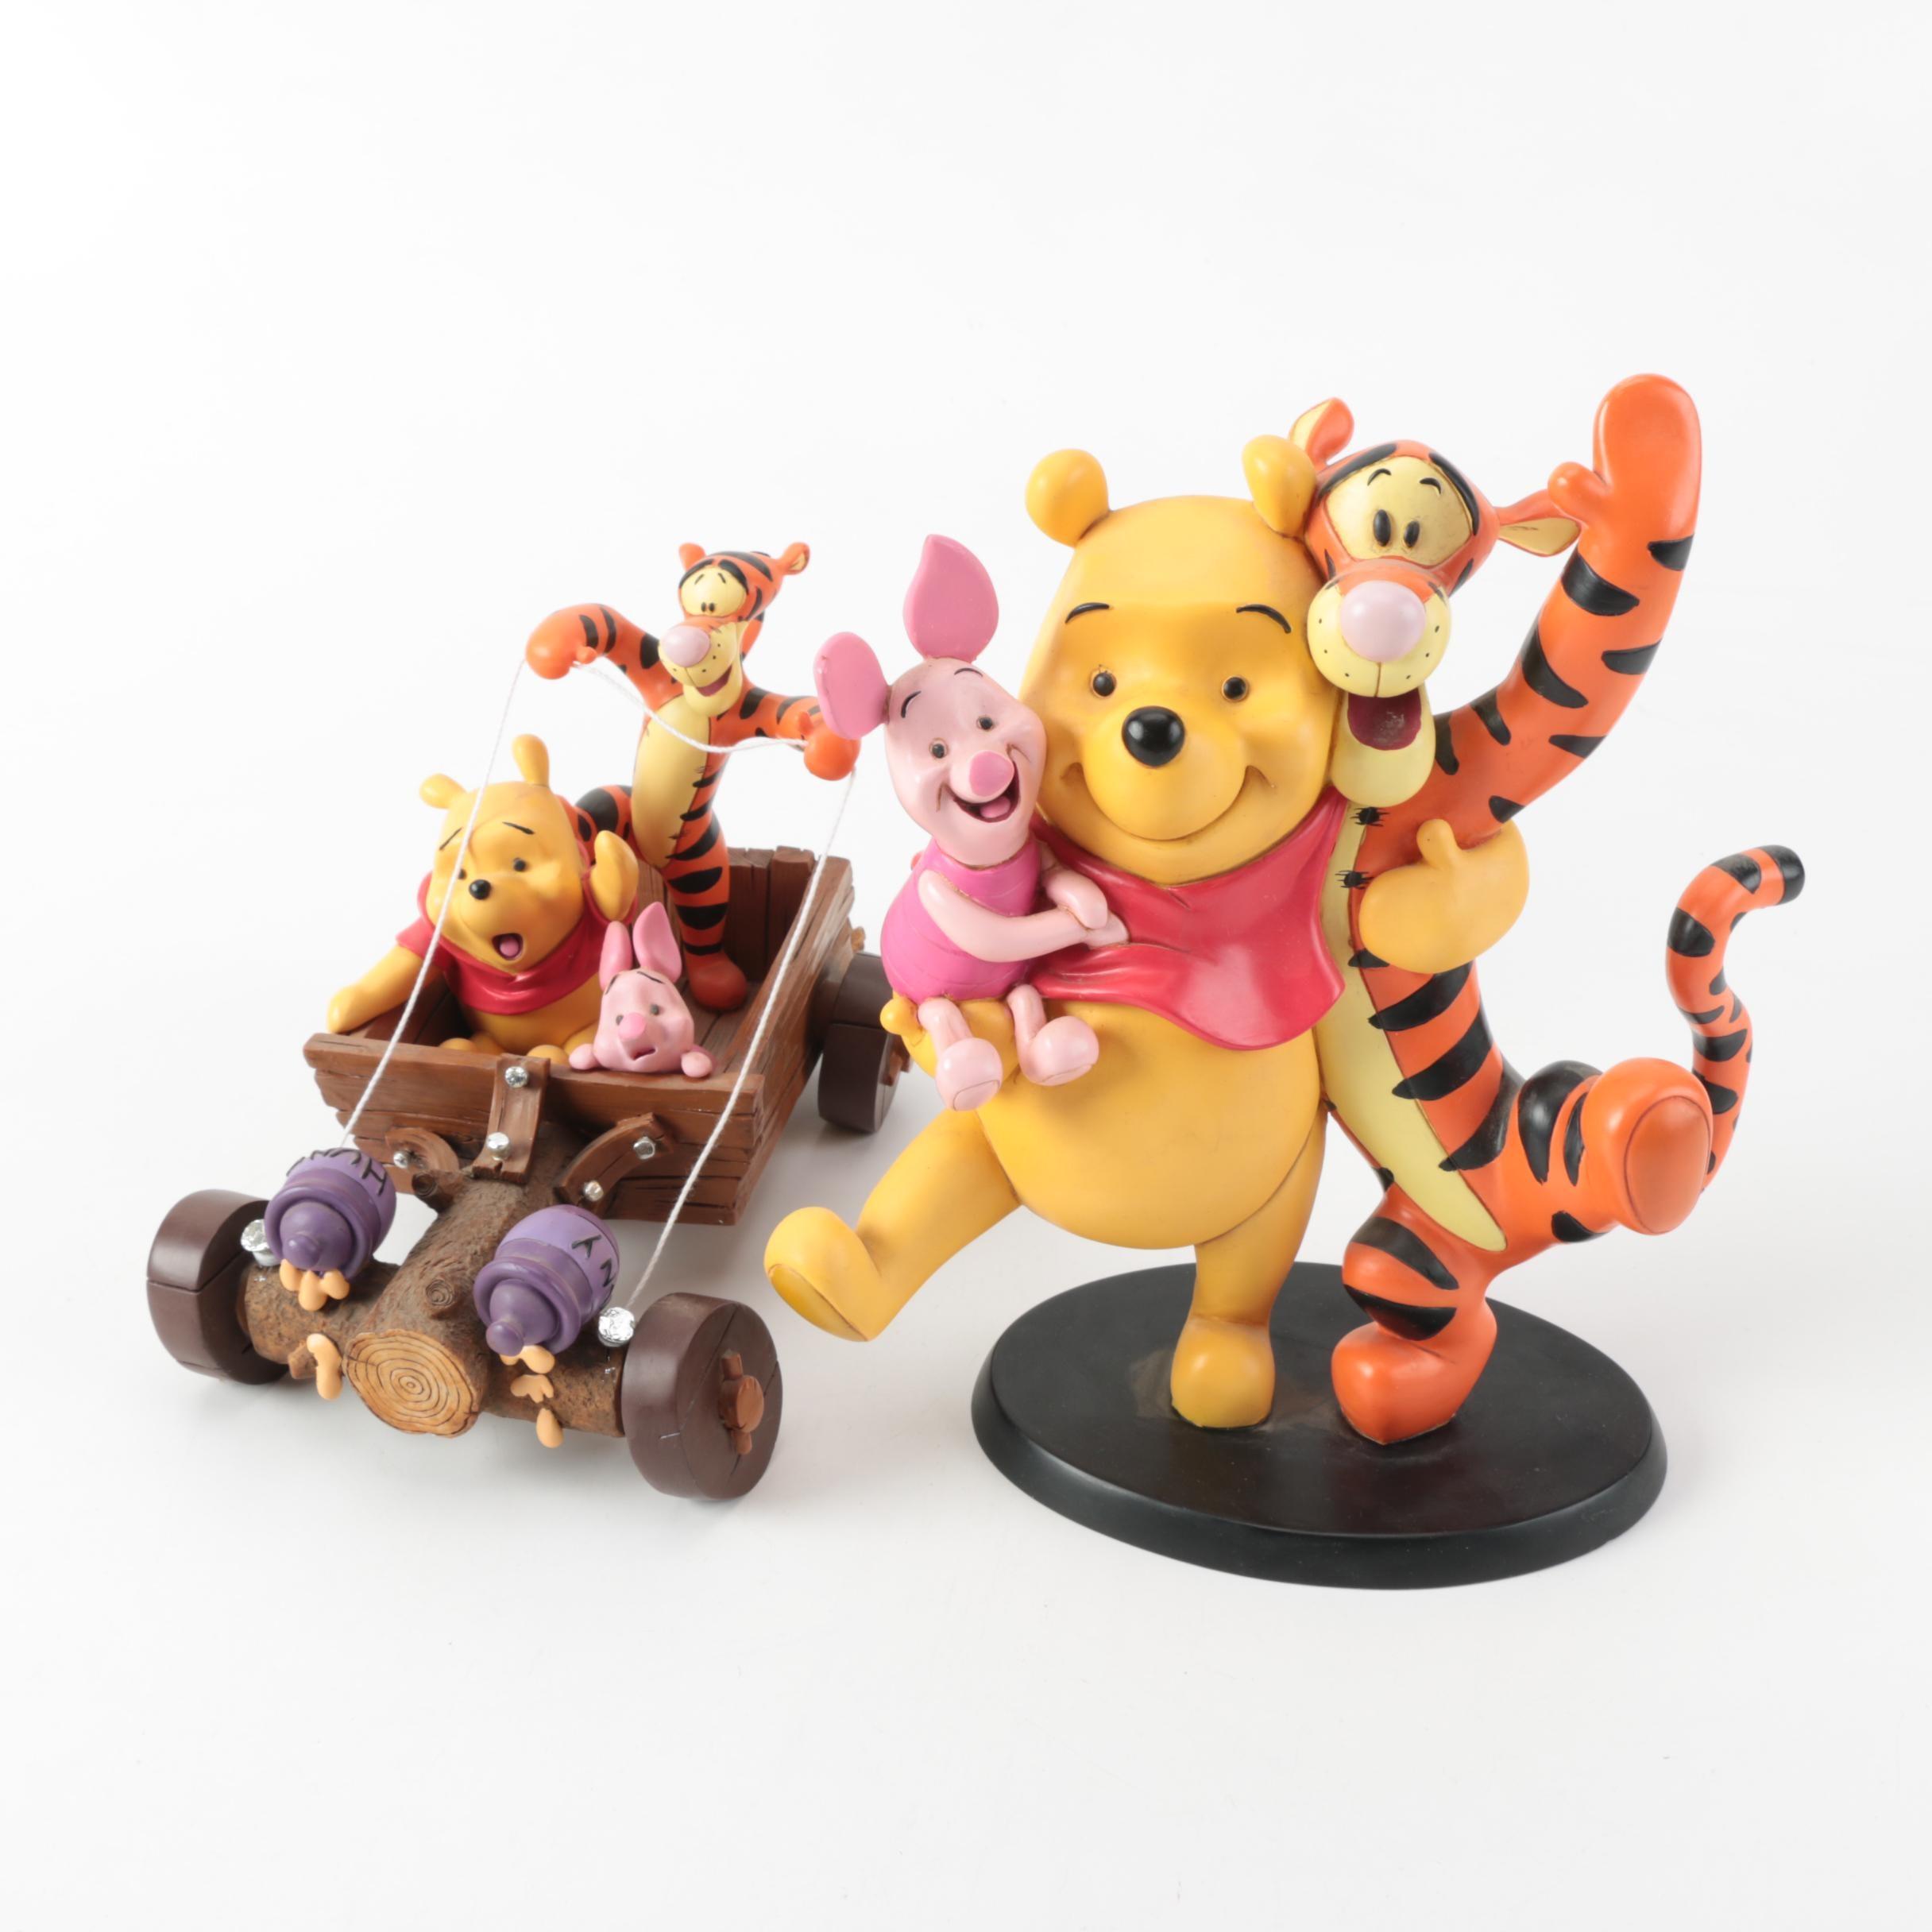 """Winnie The Pooh"" Figurines by Disney"